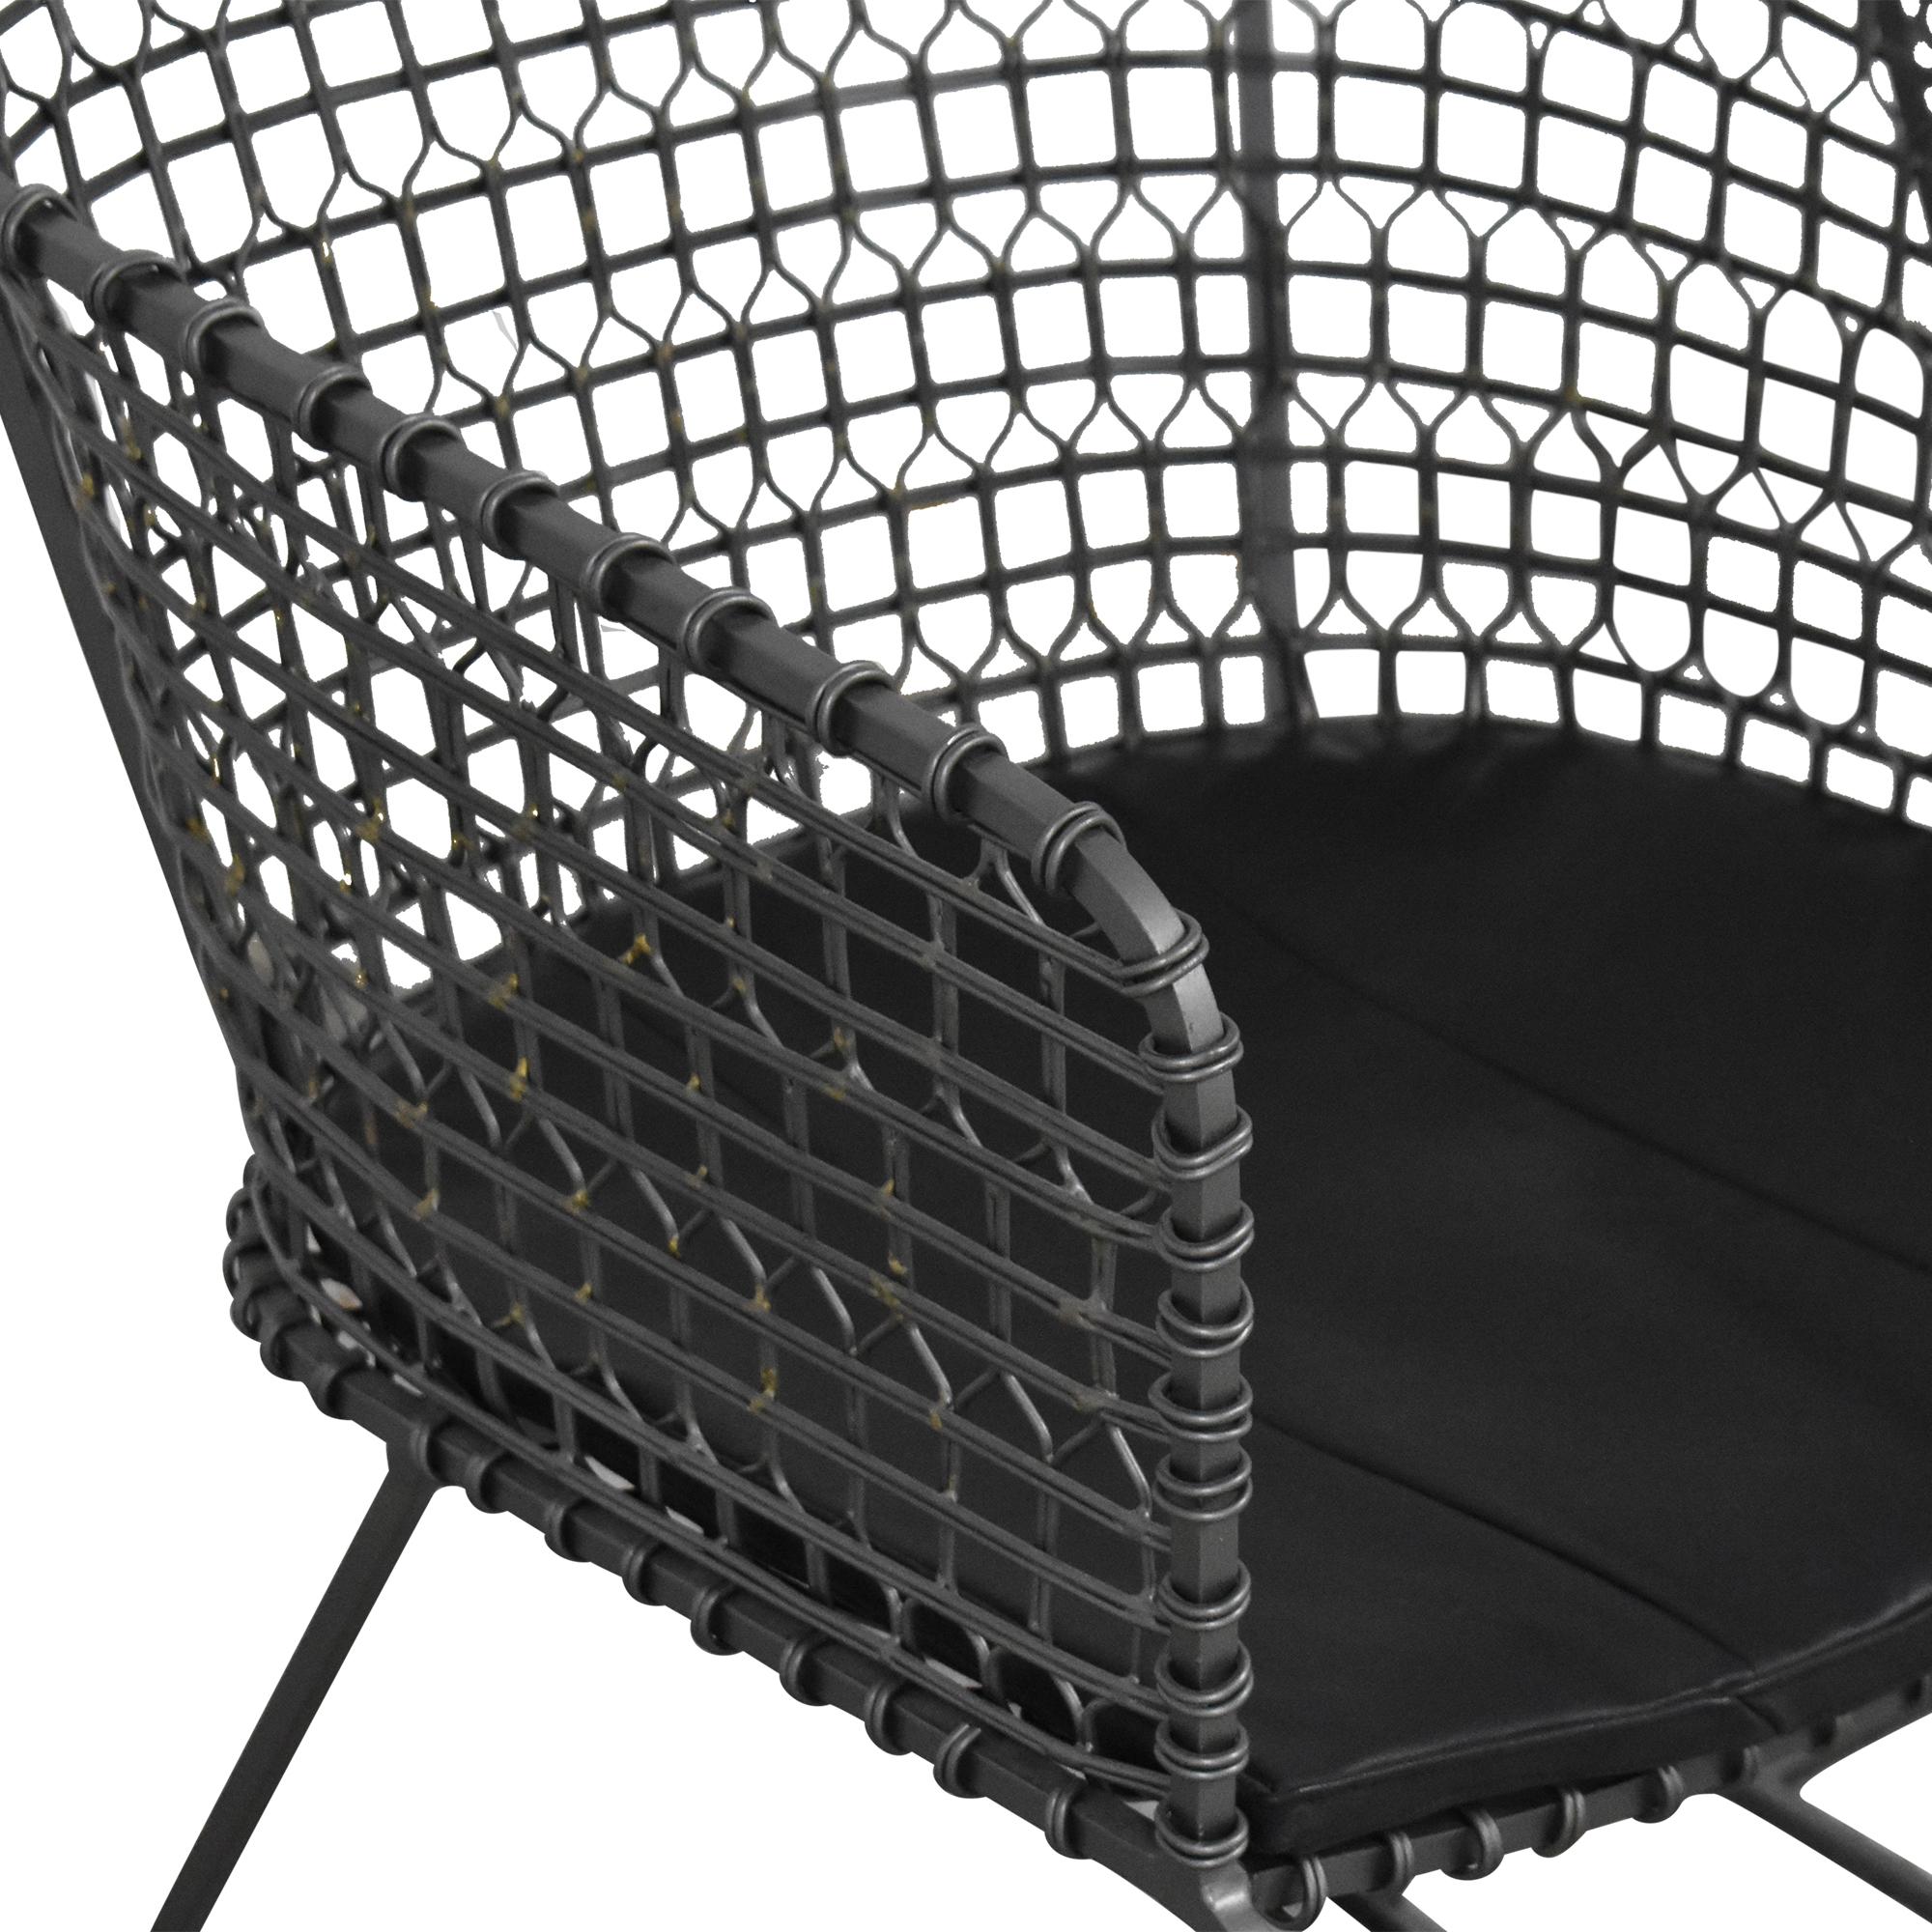 Crate & Barrel Crate & Barrel Tig Barrel Dining Chairs on sale